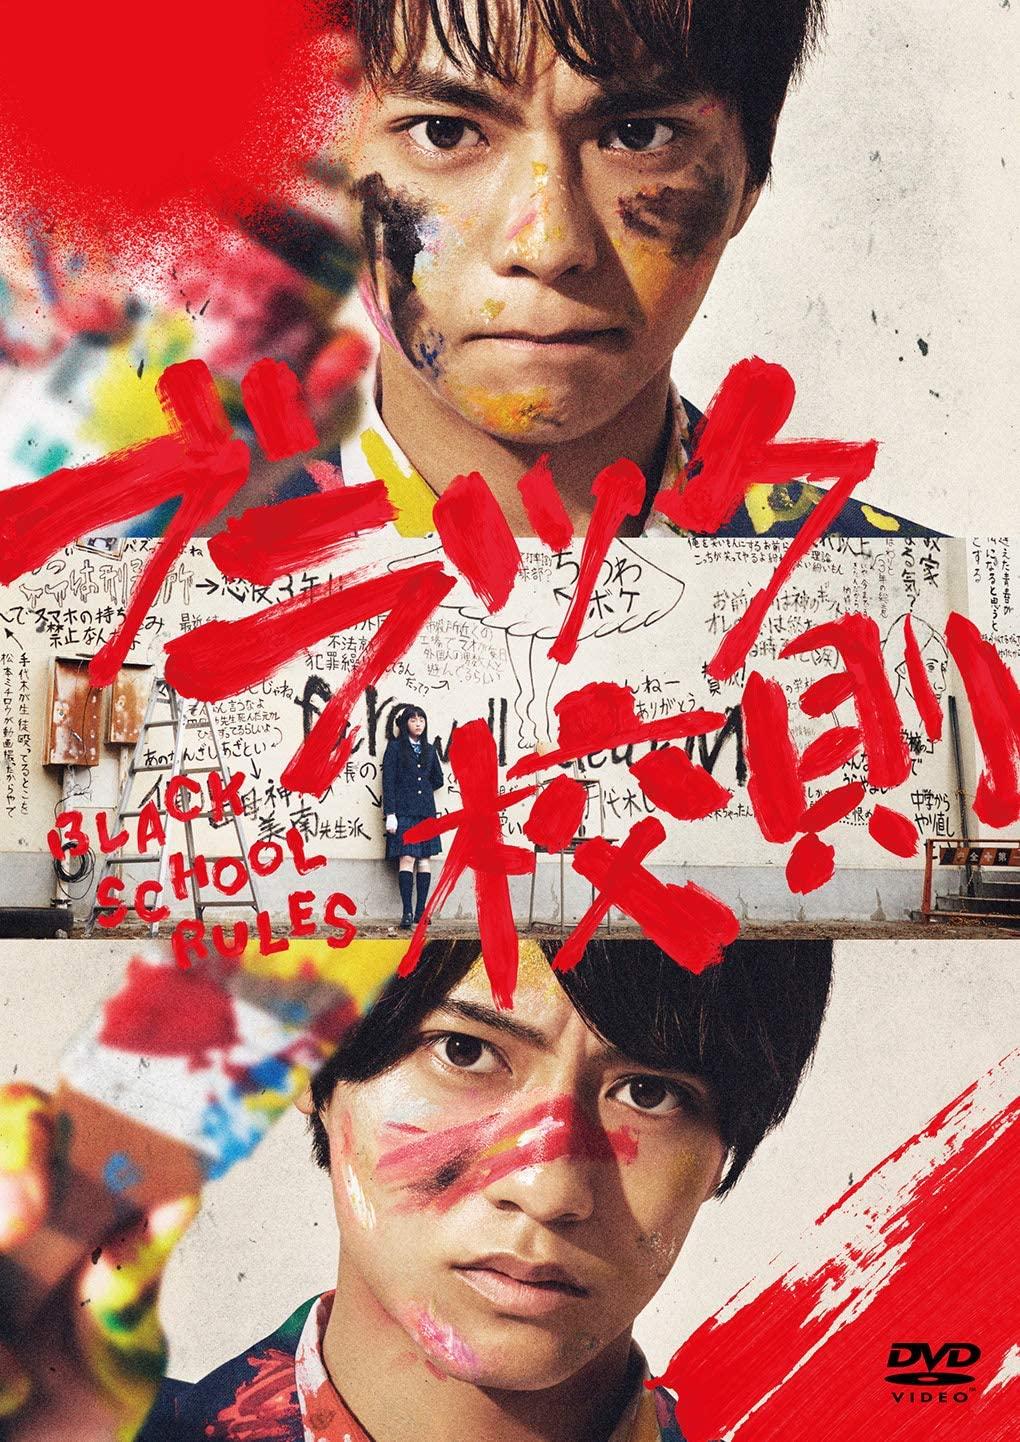 [DVD] ブラック校則